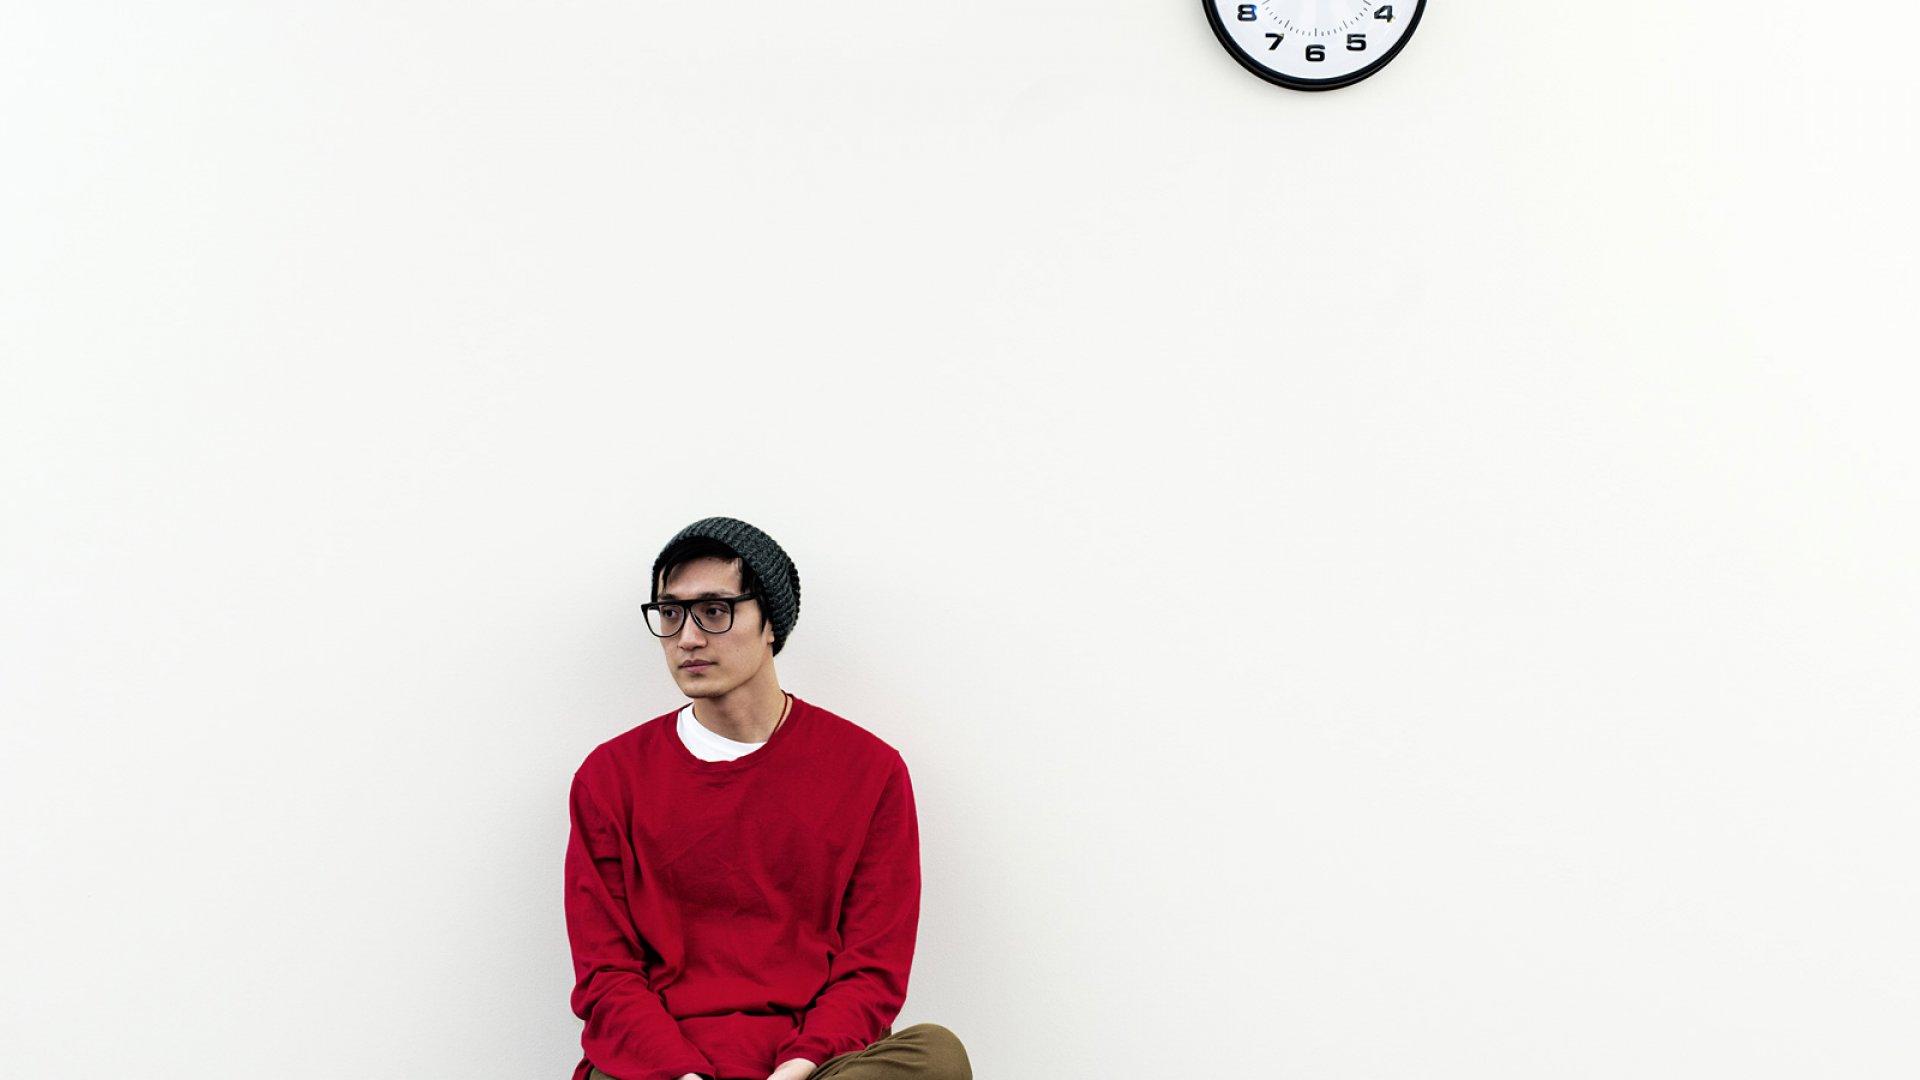 A Counterintuitive Tip for Entrepreneurs: Bide Your Time